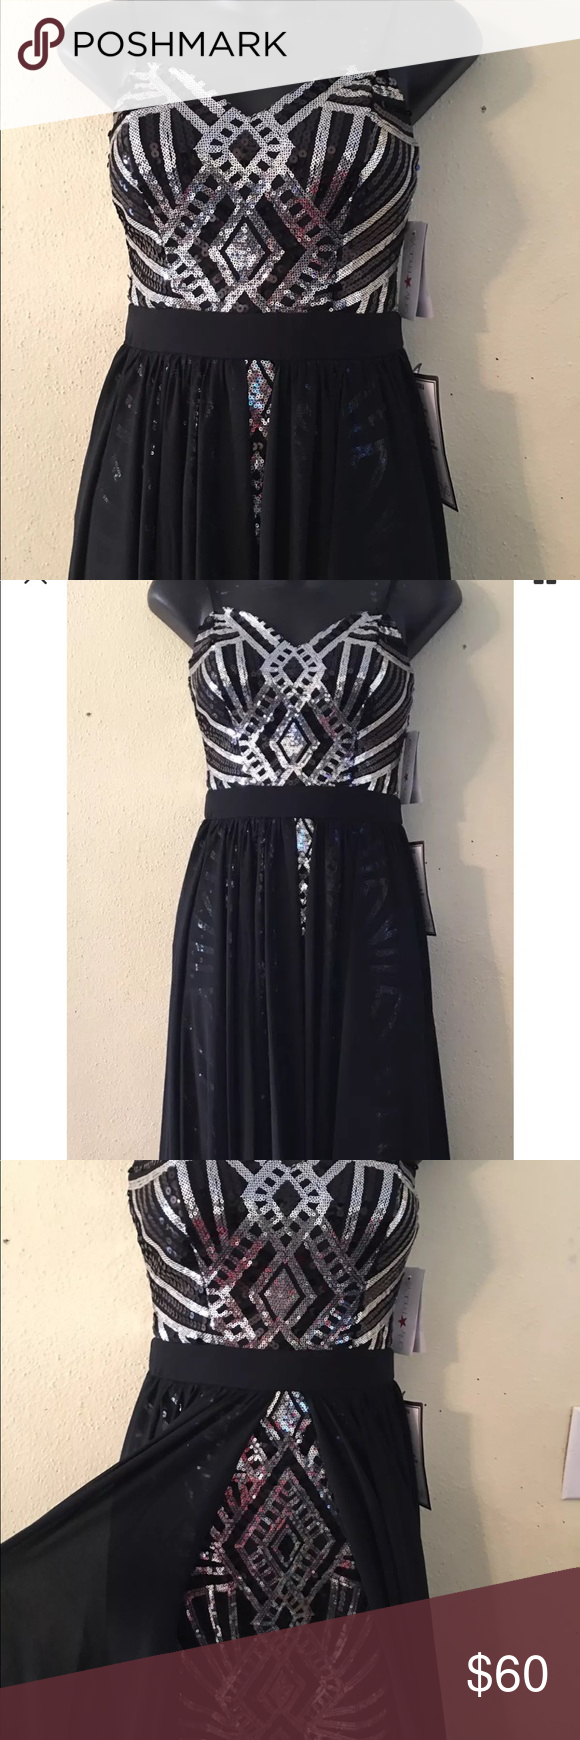 0c58afc5ced City studio black silver sequin handkerchief SZ 1 This is a gorgeous dress  by city studio